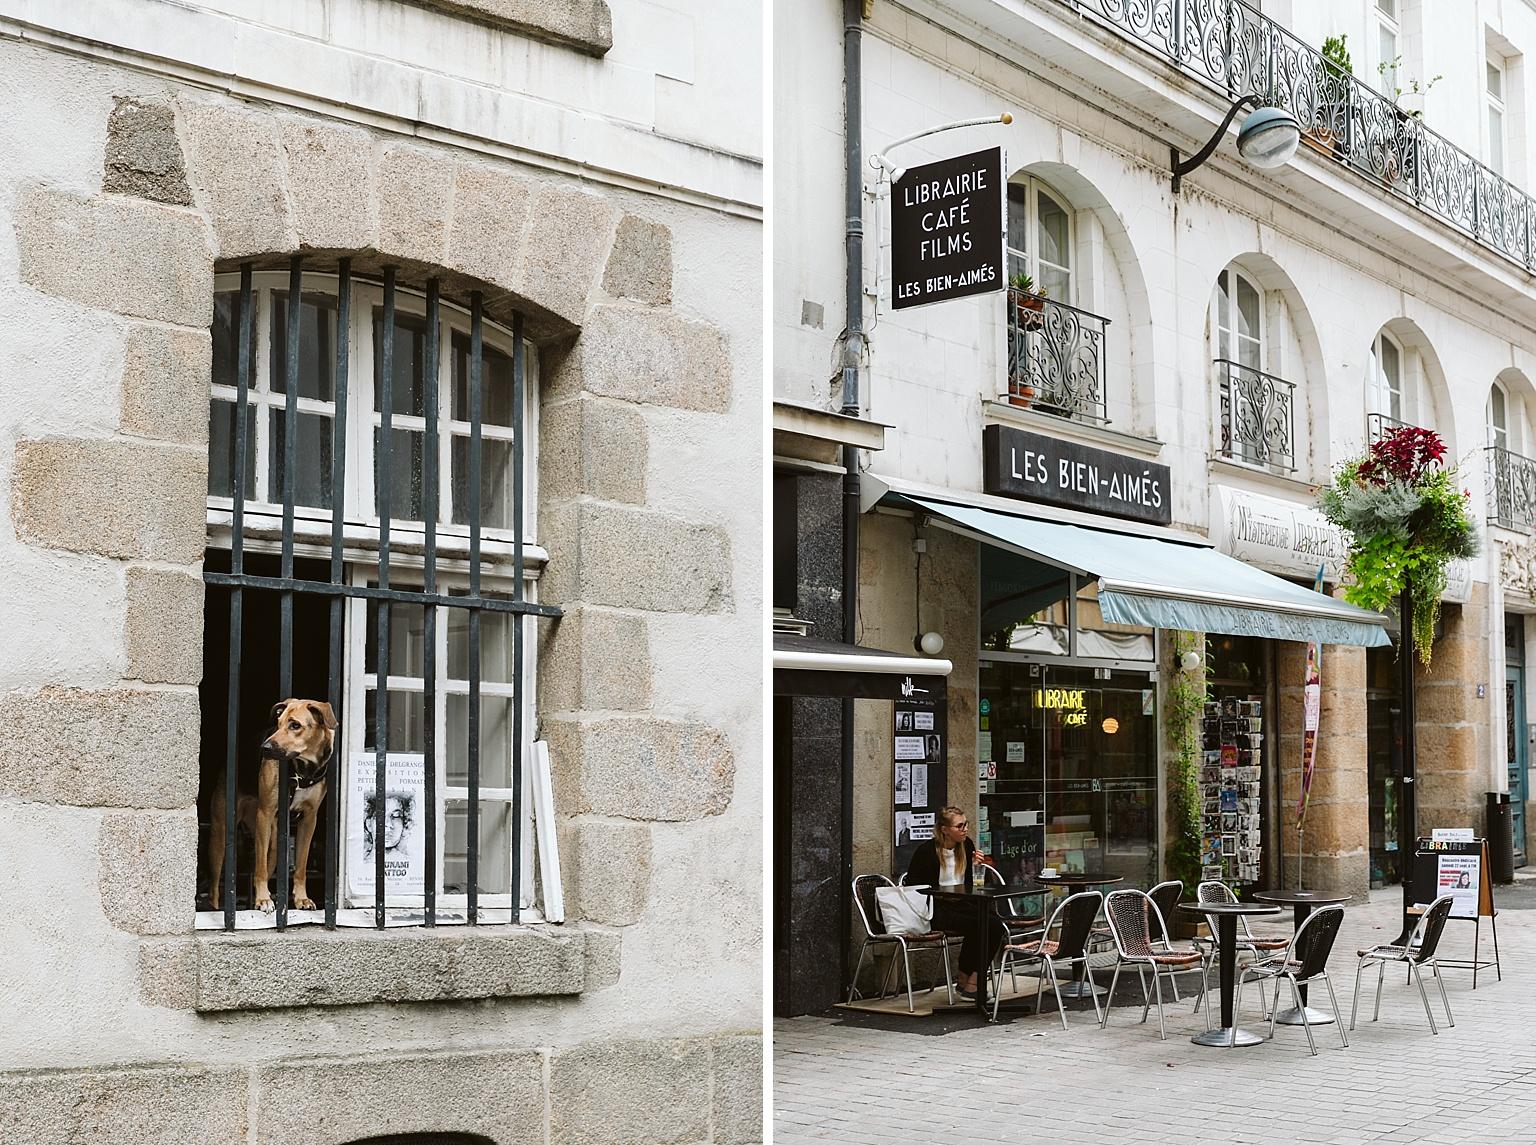 nantes france travel photography swan dives co 2018 3.jpg